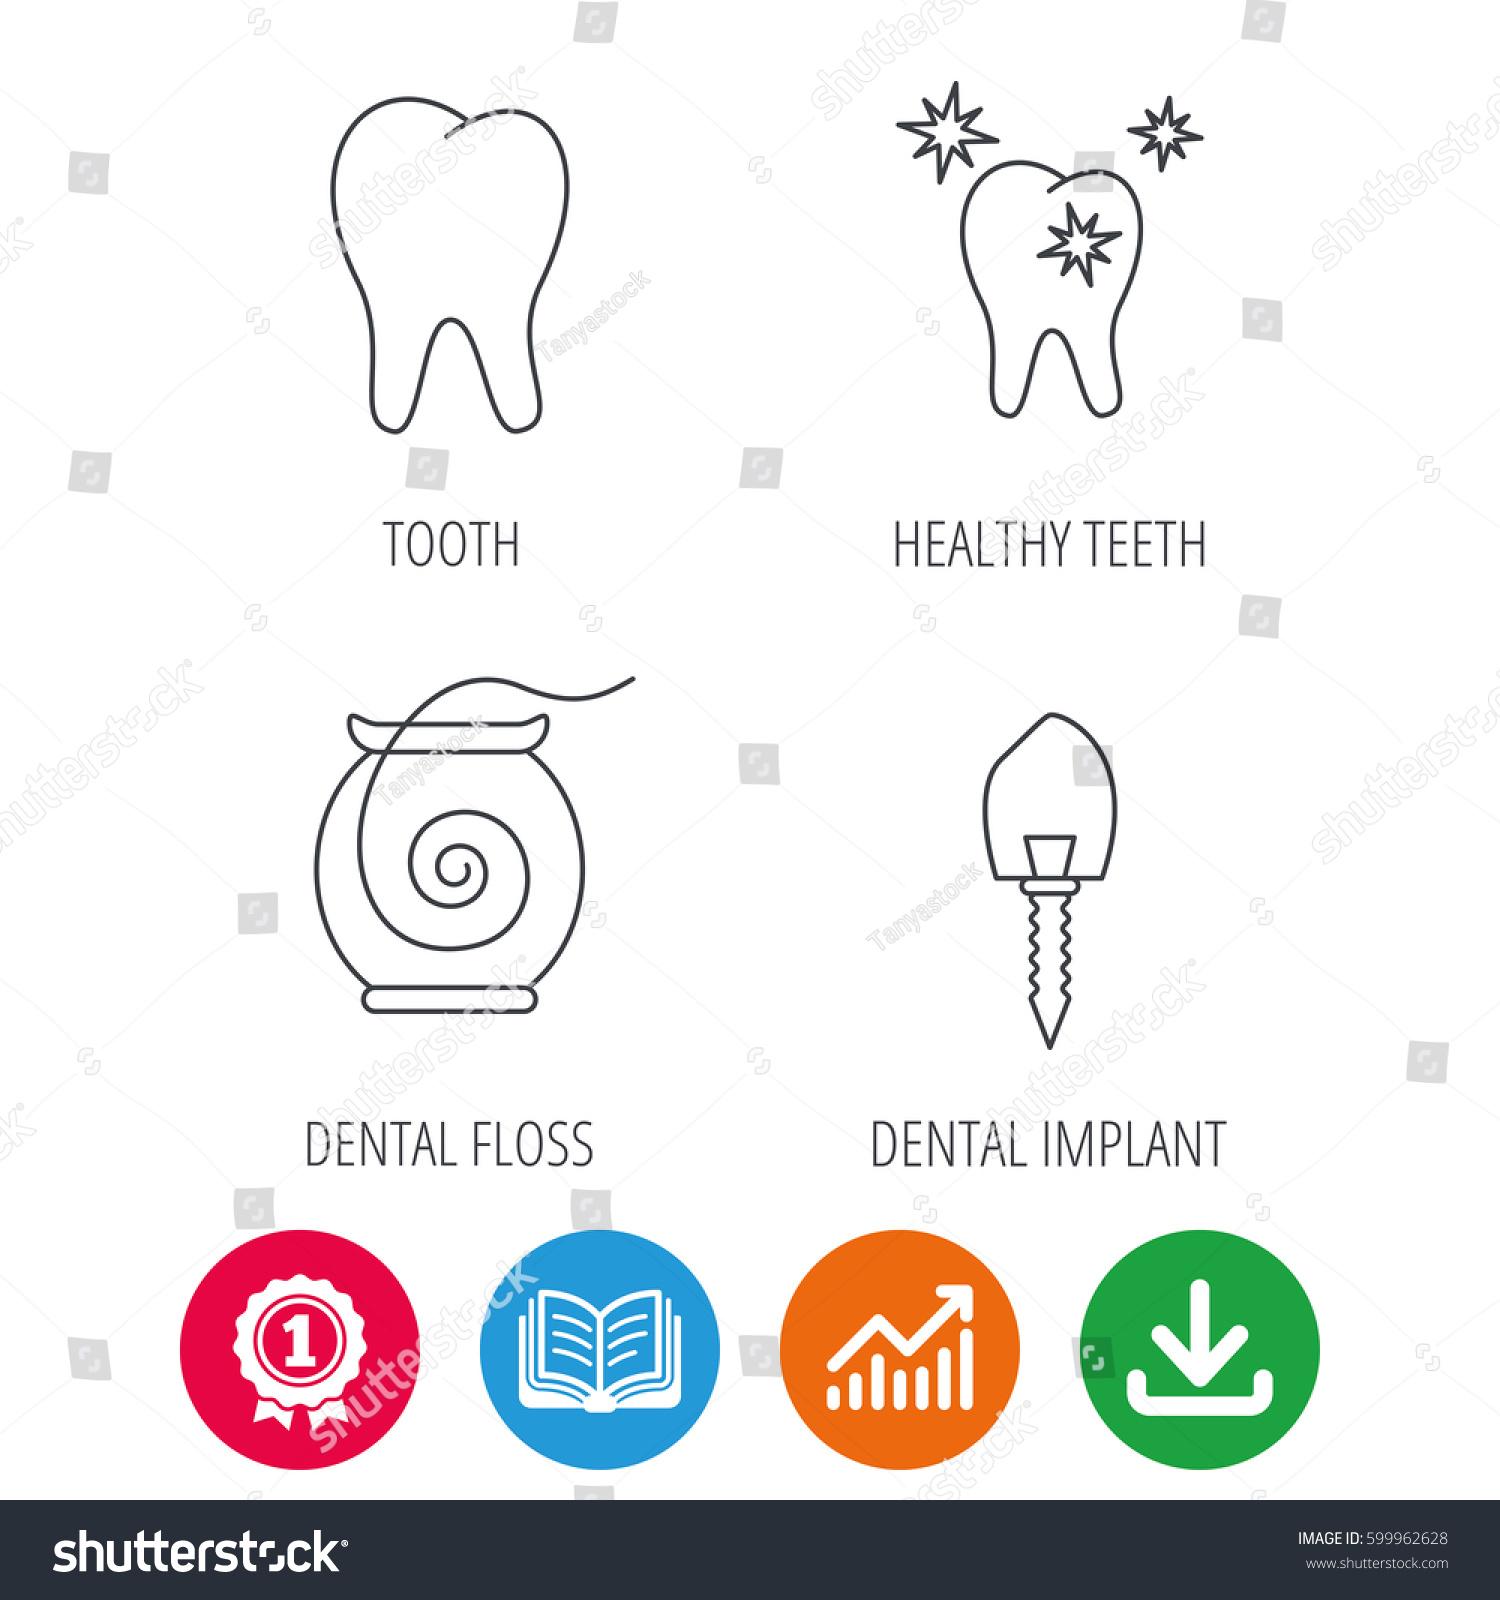 Teeth growth chart targergolden dragon teeth growth chart nvjuhfo Gallery